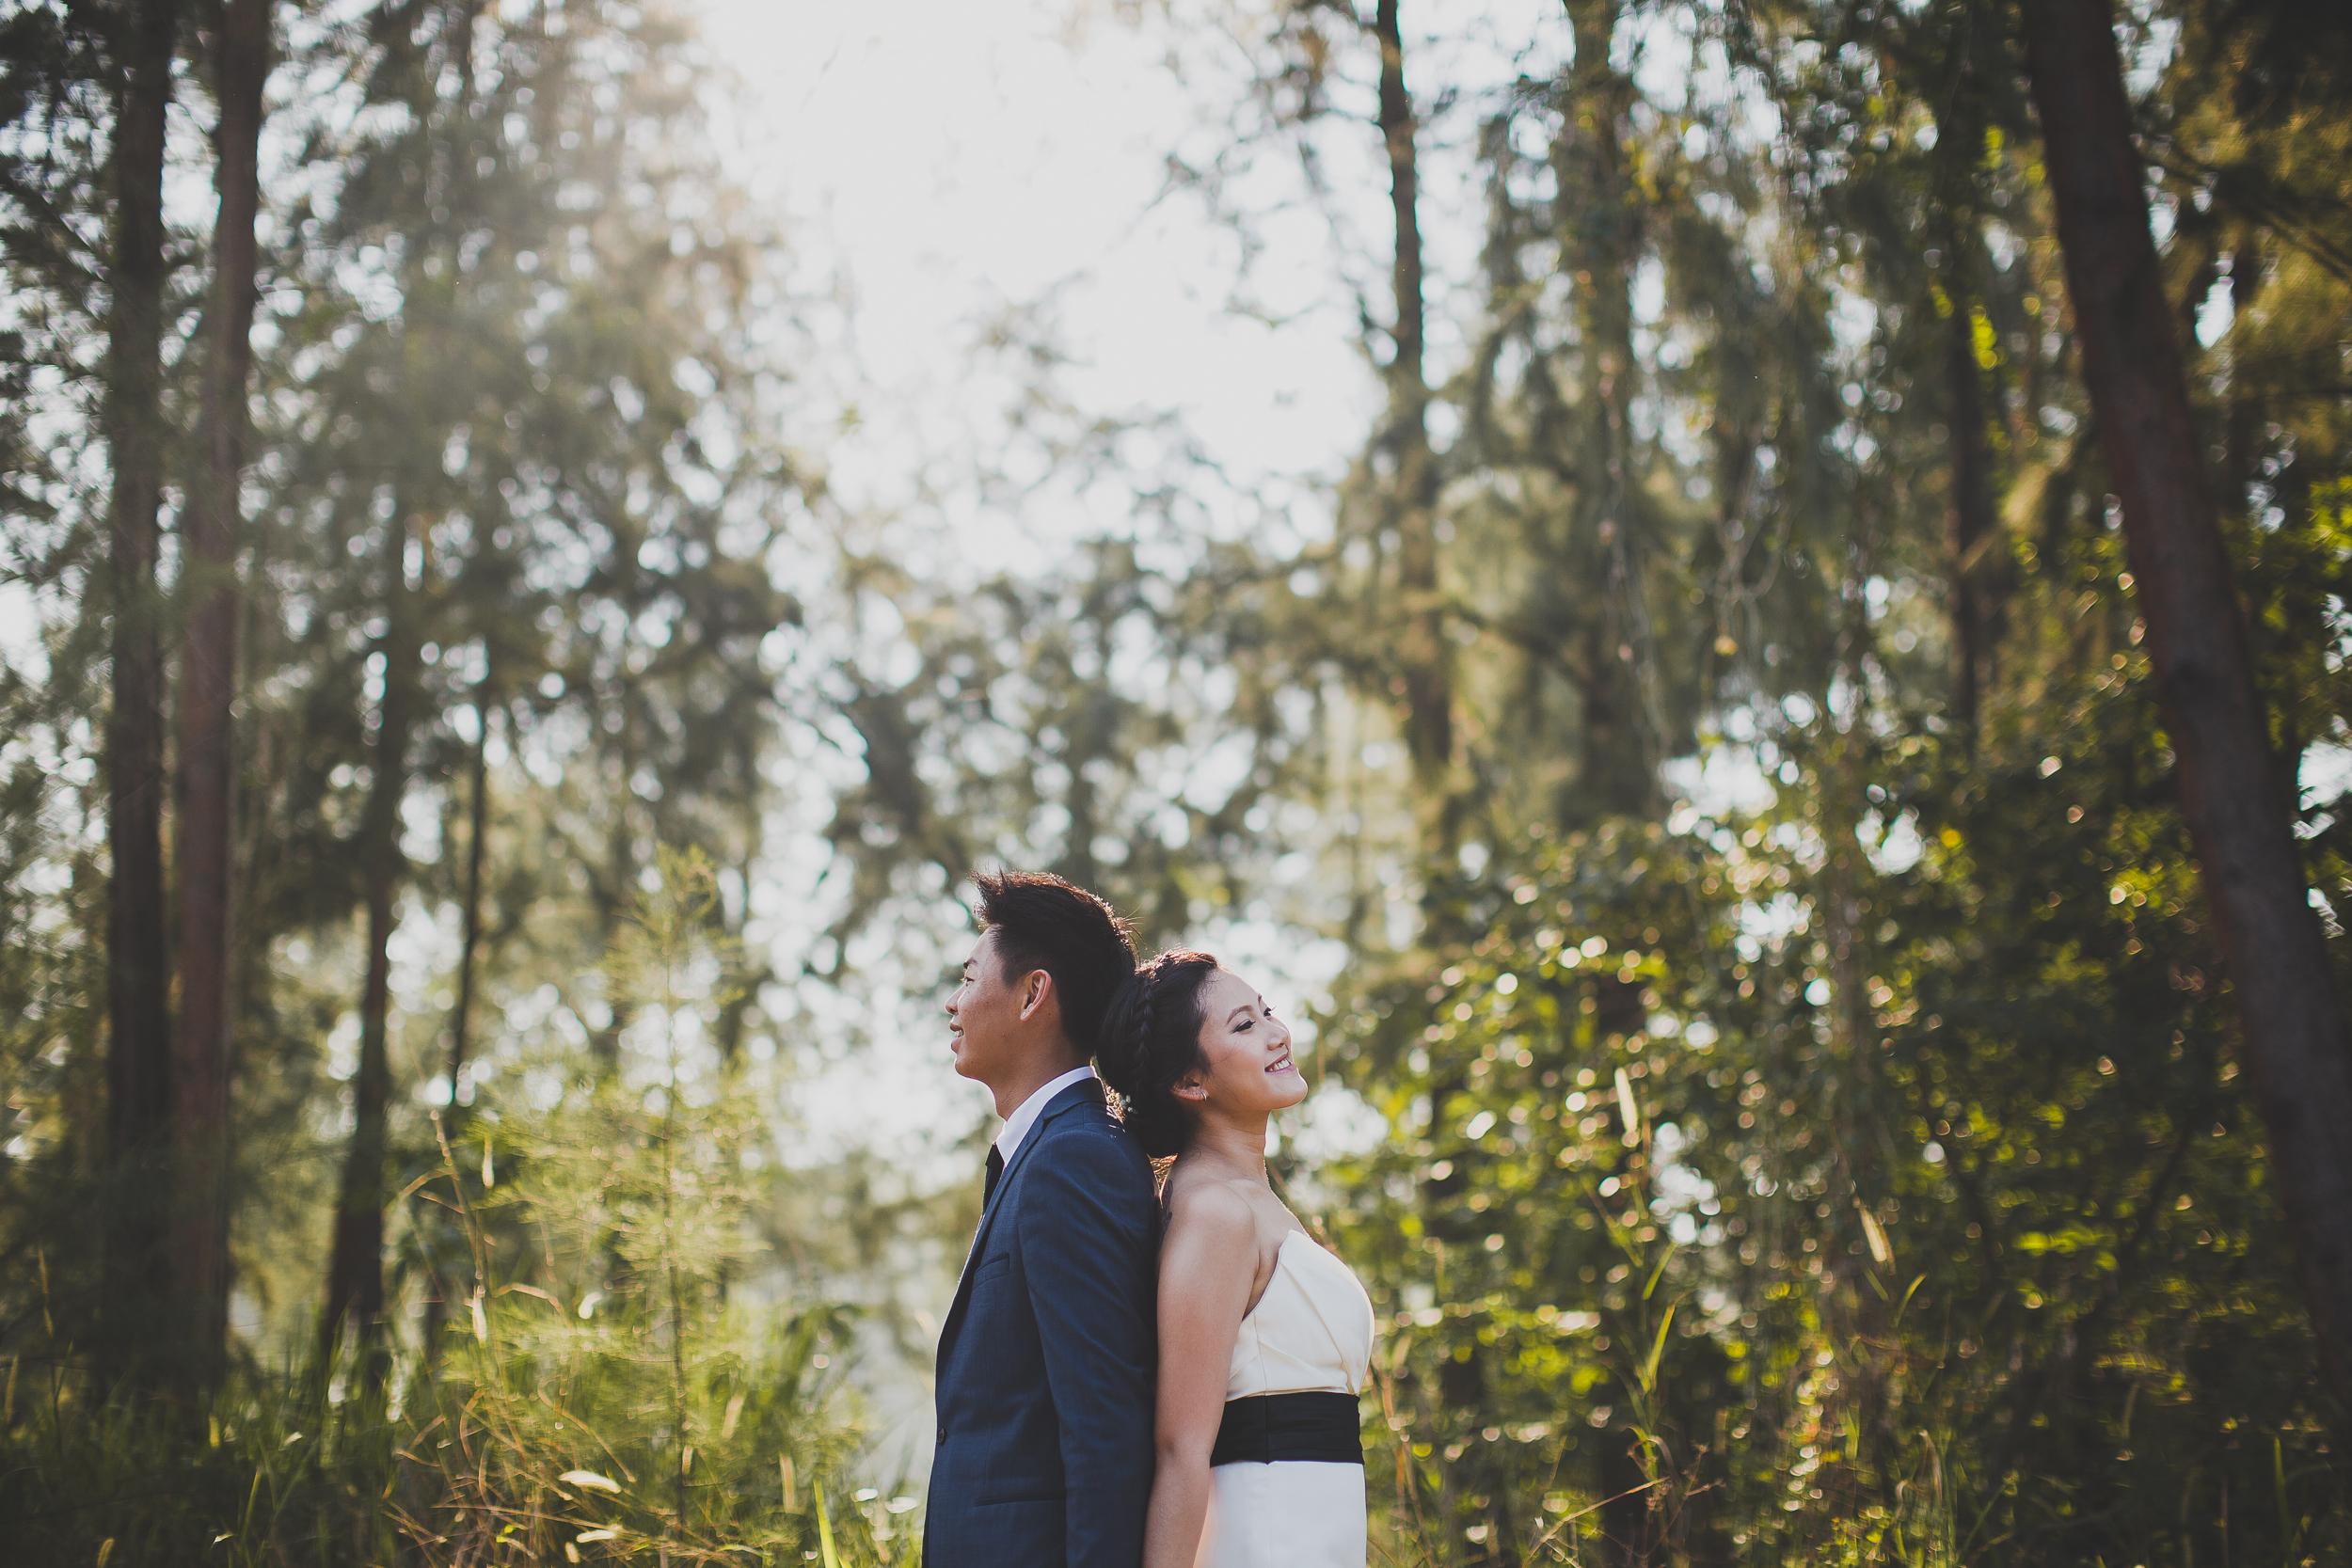 Singapore+Pre+Wedding+Photographer+Ziyang+Clara-0025.jpg